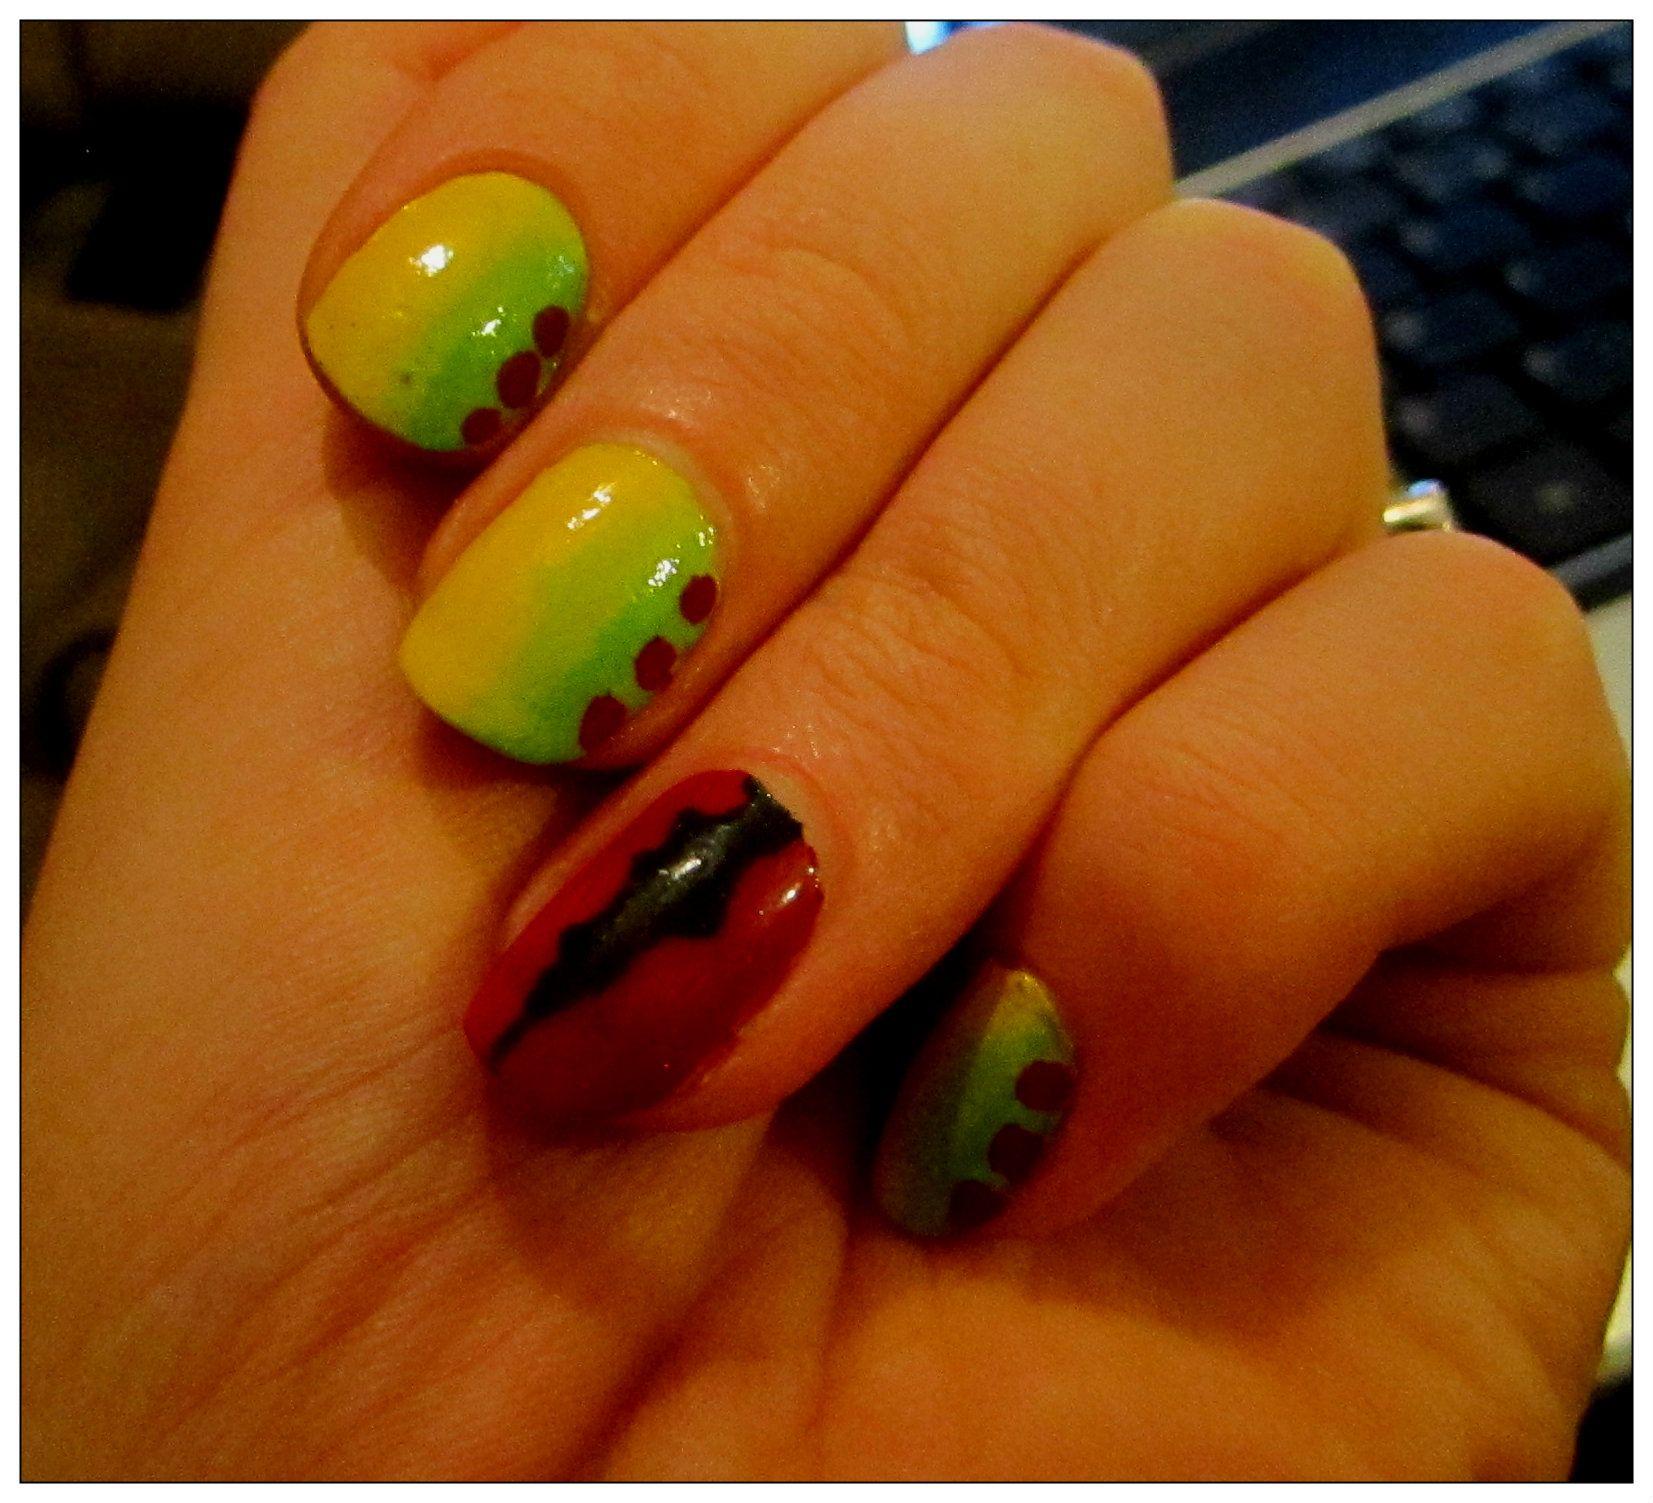 Vaguely Jurassic Park themed nails #nailart #jurassicpark   Nail art ...